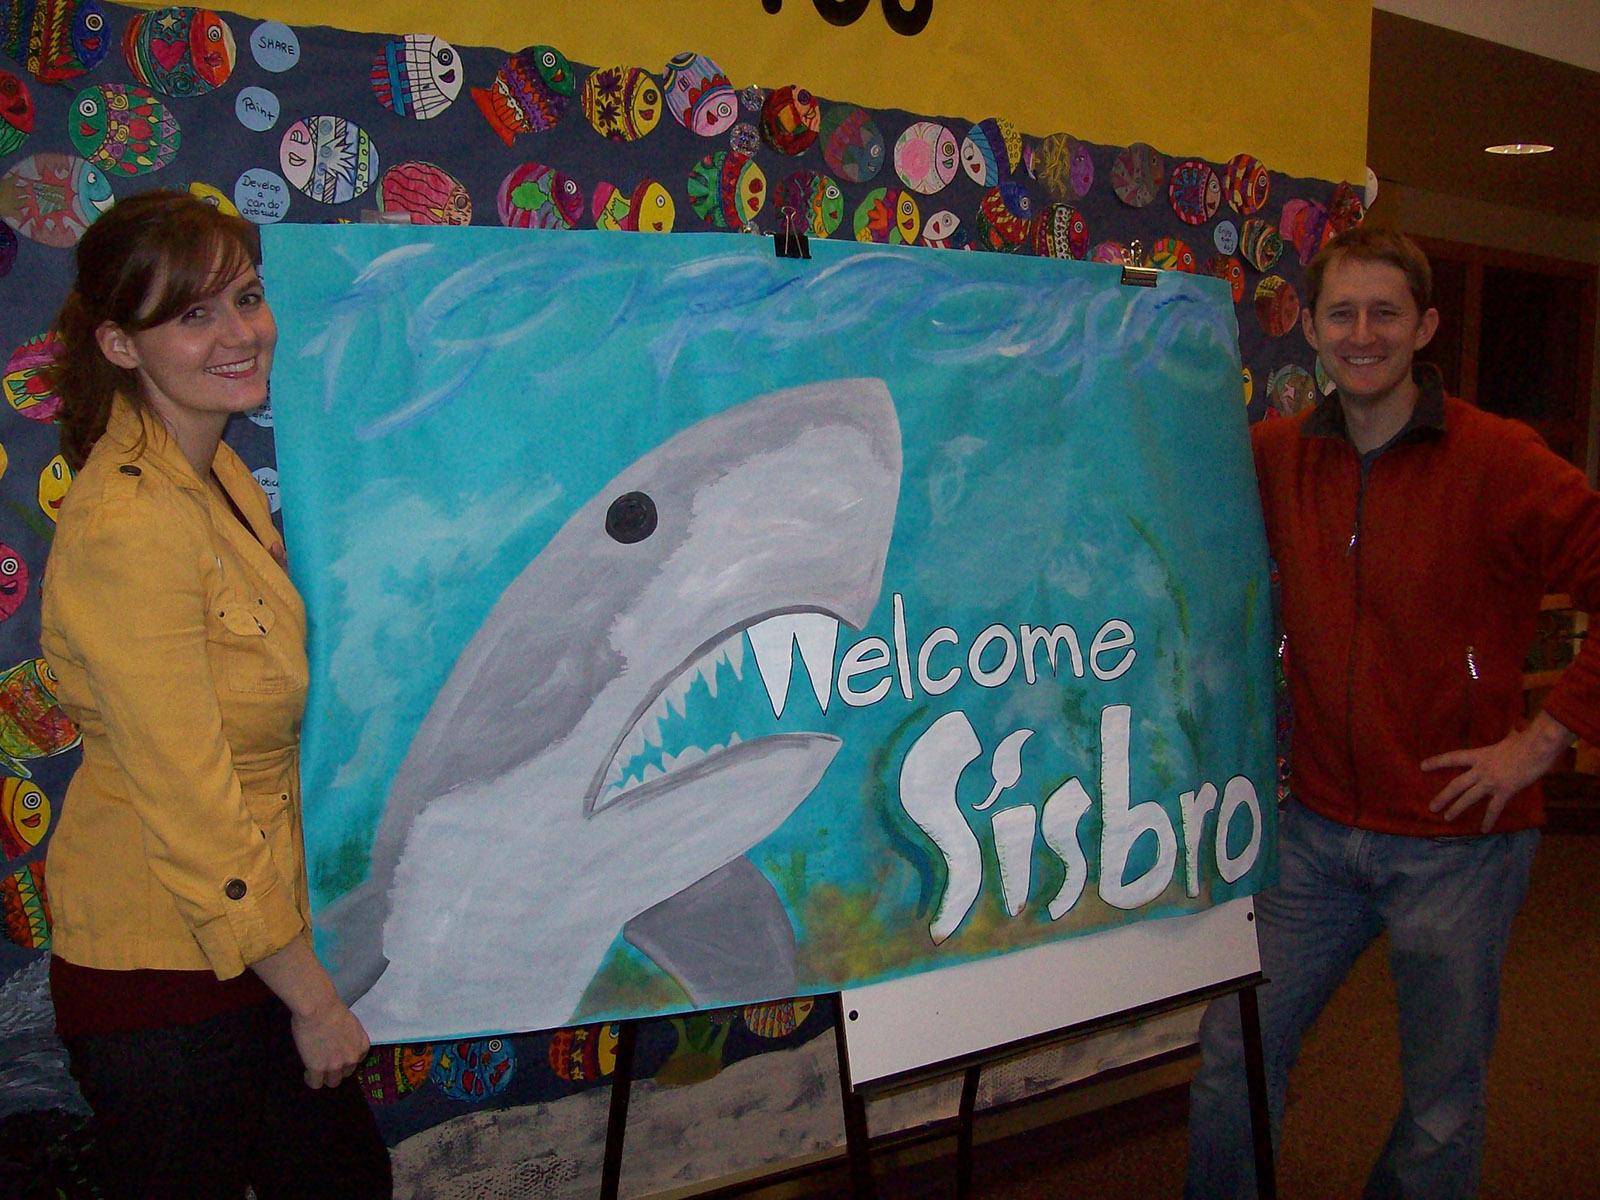 Welcome Sisbro